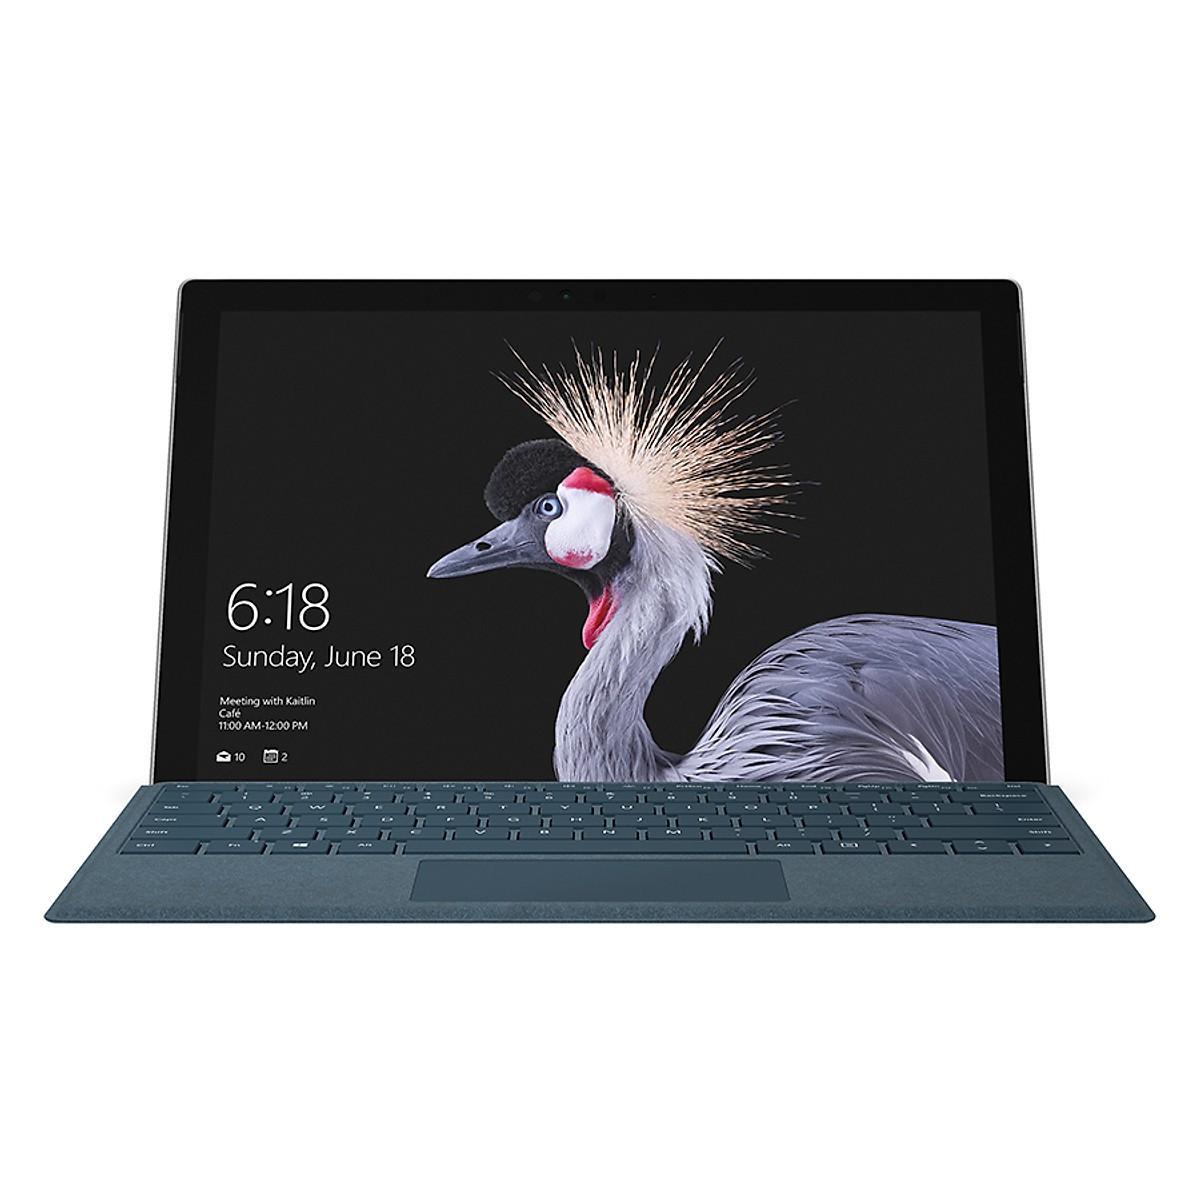 "Laptop Microsoft Surface Pro 6 2018 12.3"" (i5/8GB/128GB)"